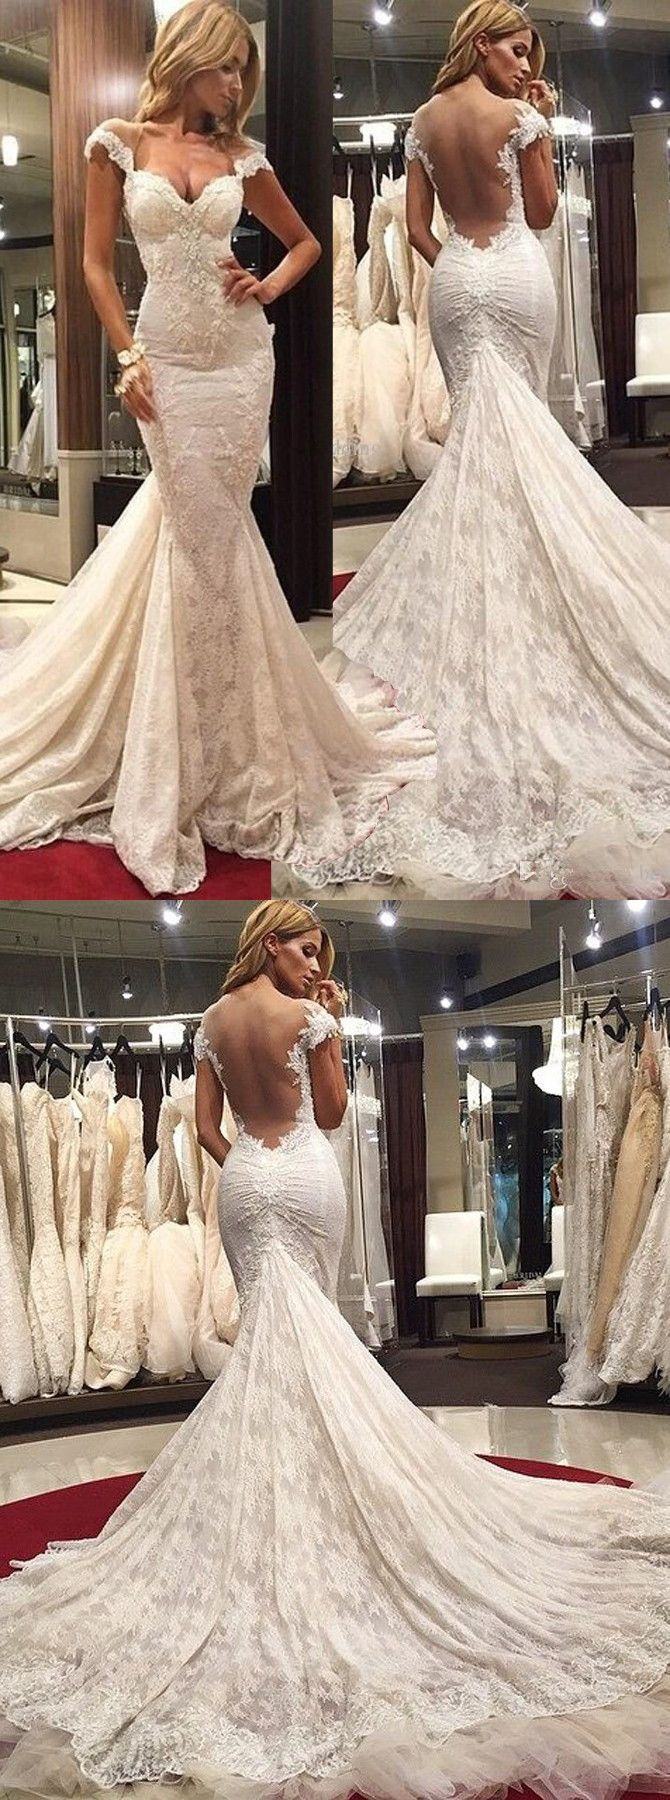 Court Train Lace Mermaid Wedding Dress white wedding dress 2017 wedding dress